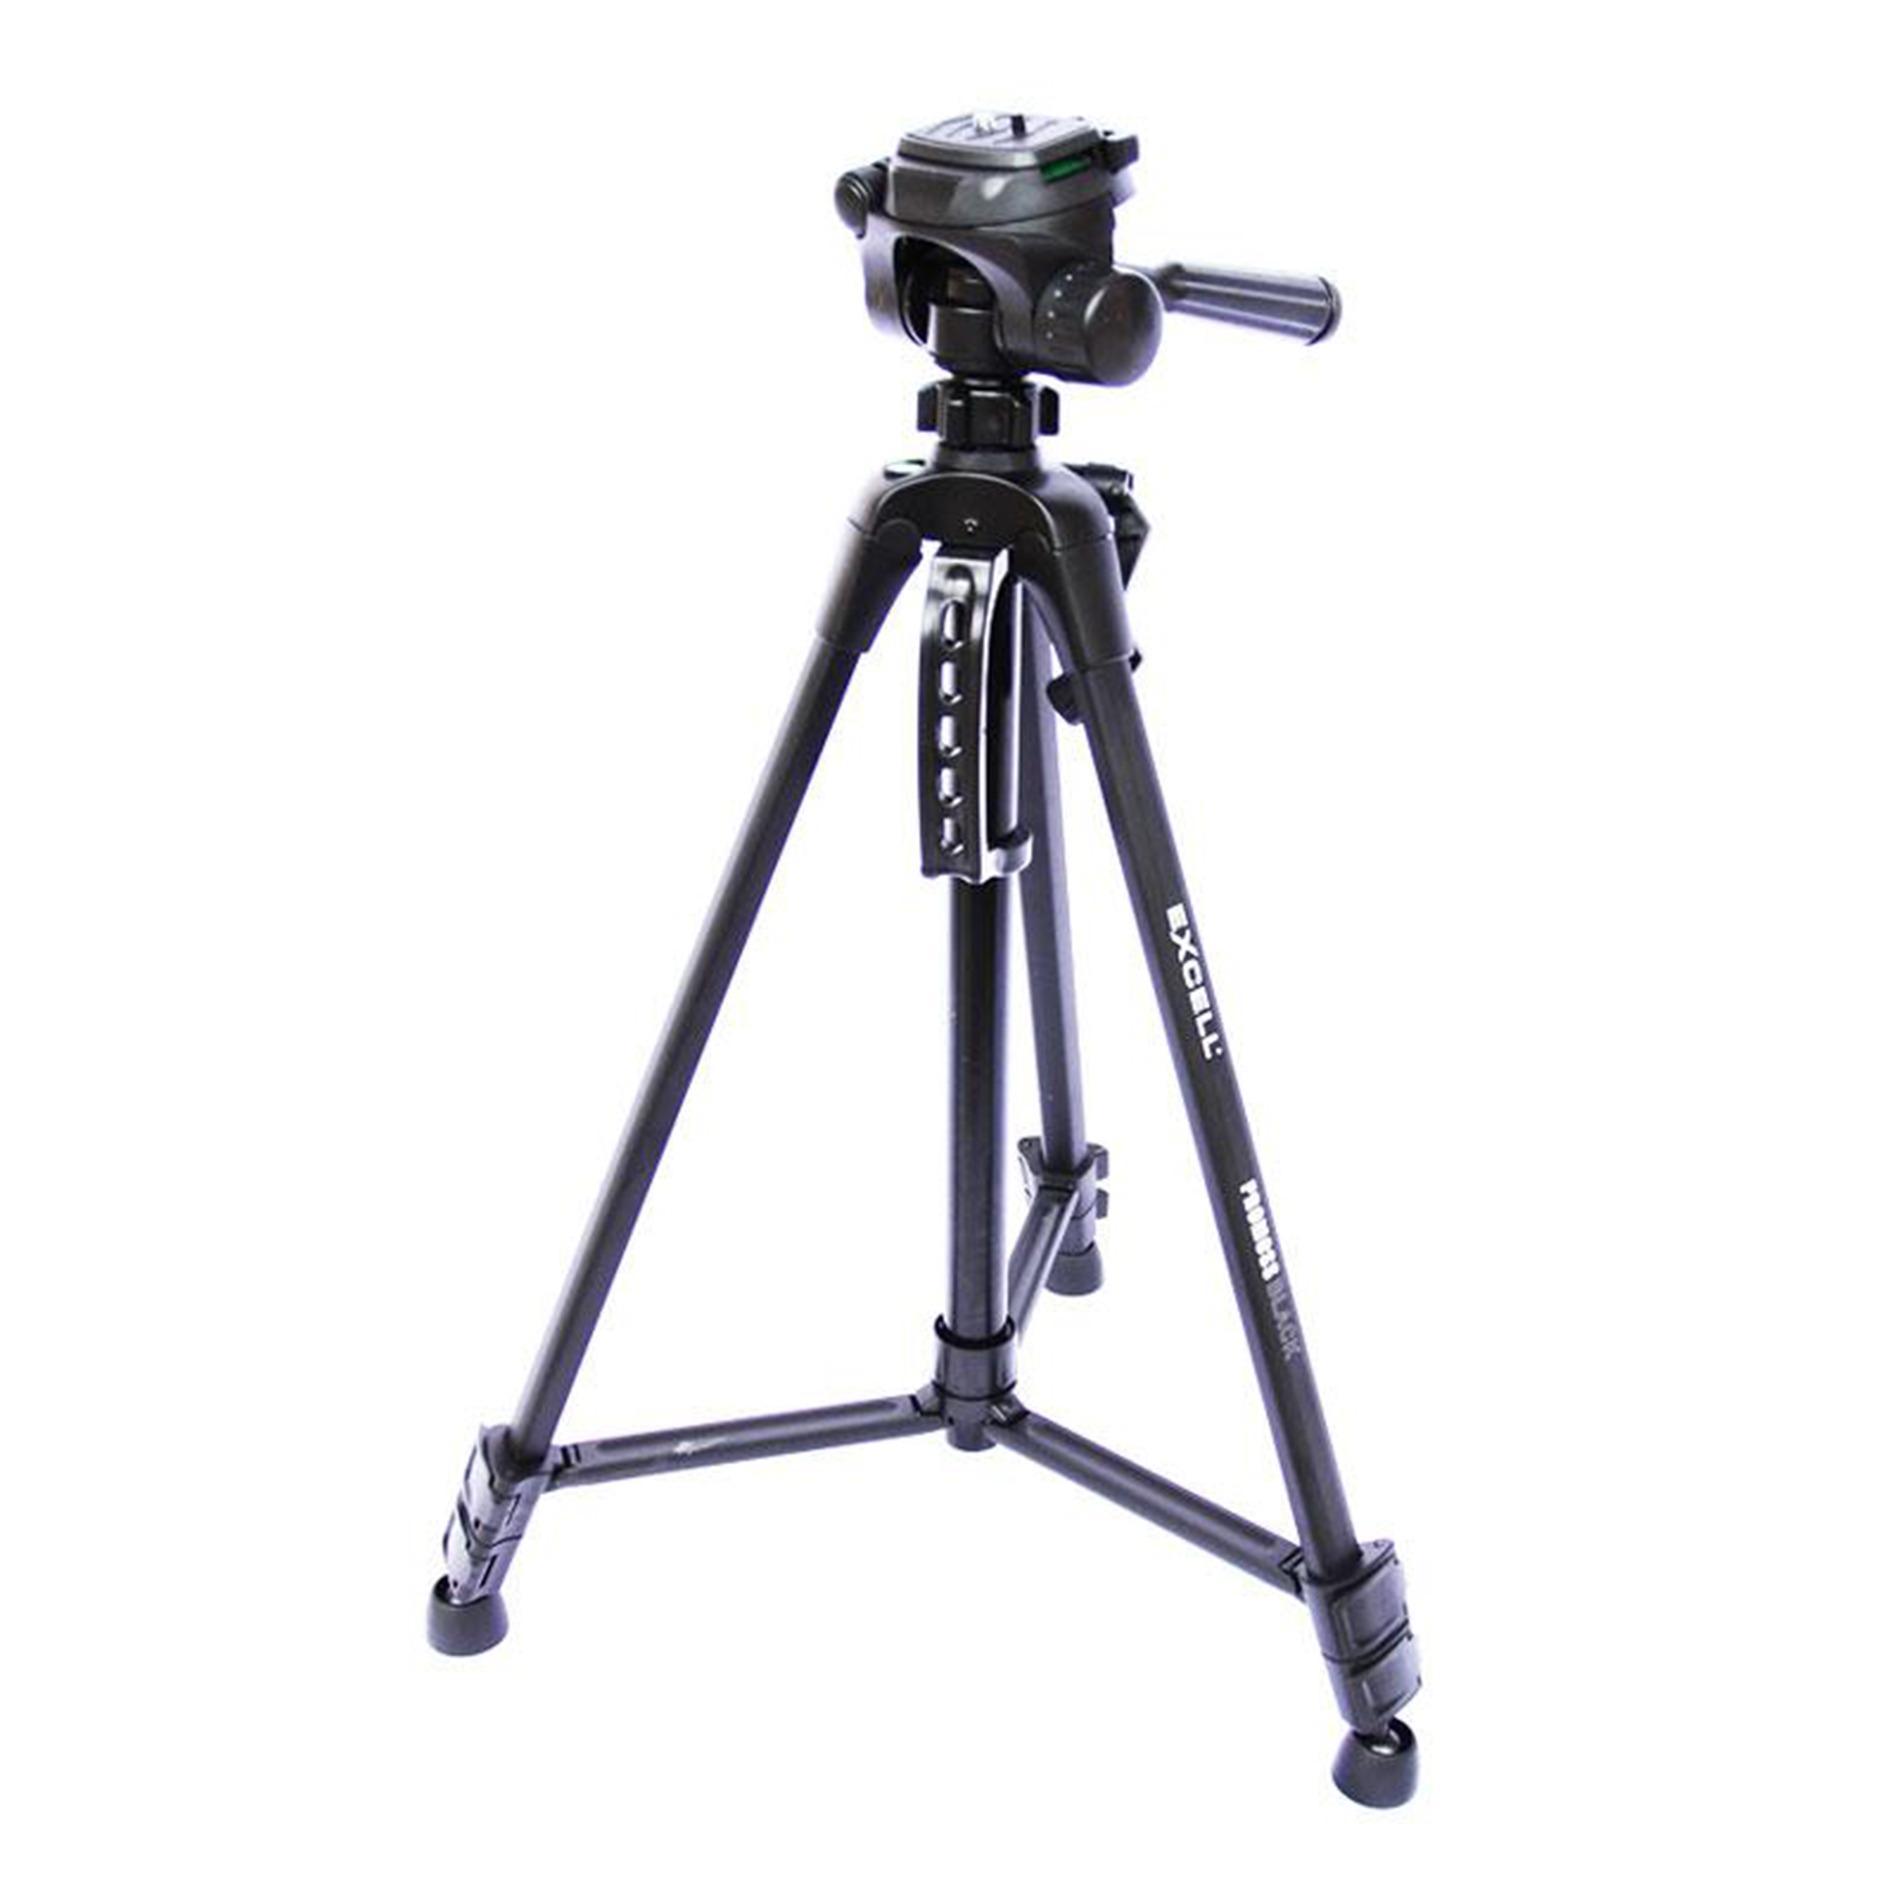 Tripod EXCELL PROMOSS BLACK Kamera Slr Dslr Mirrorless Gopro Hp